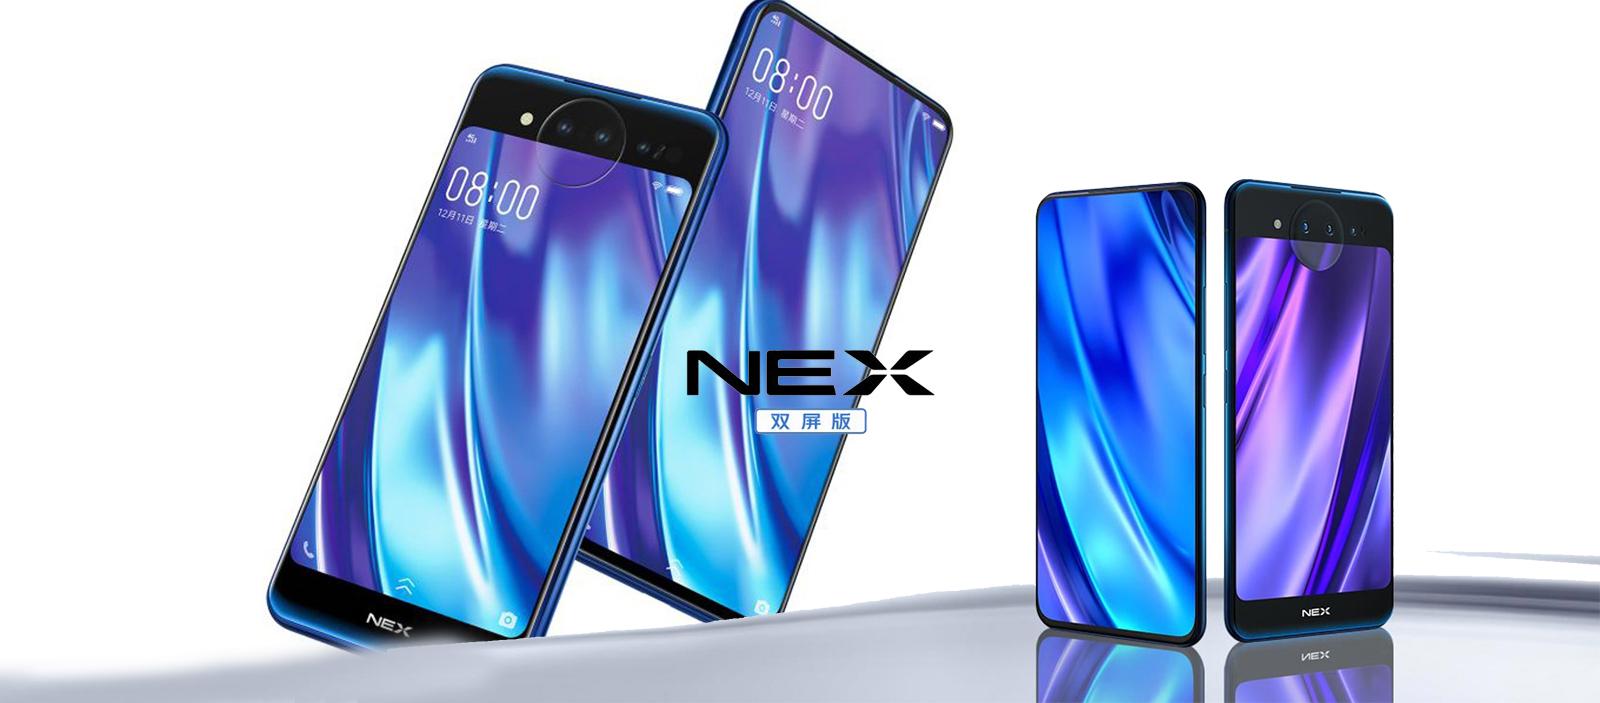 Vivo NEX Dual Display Smartphone Review